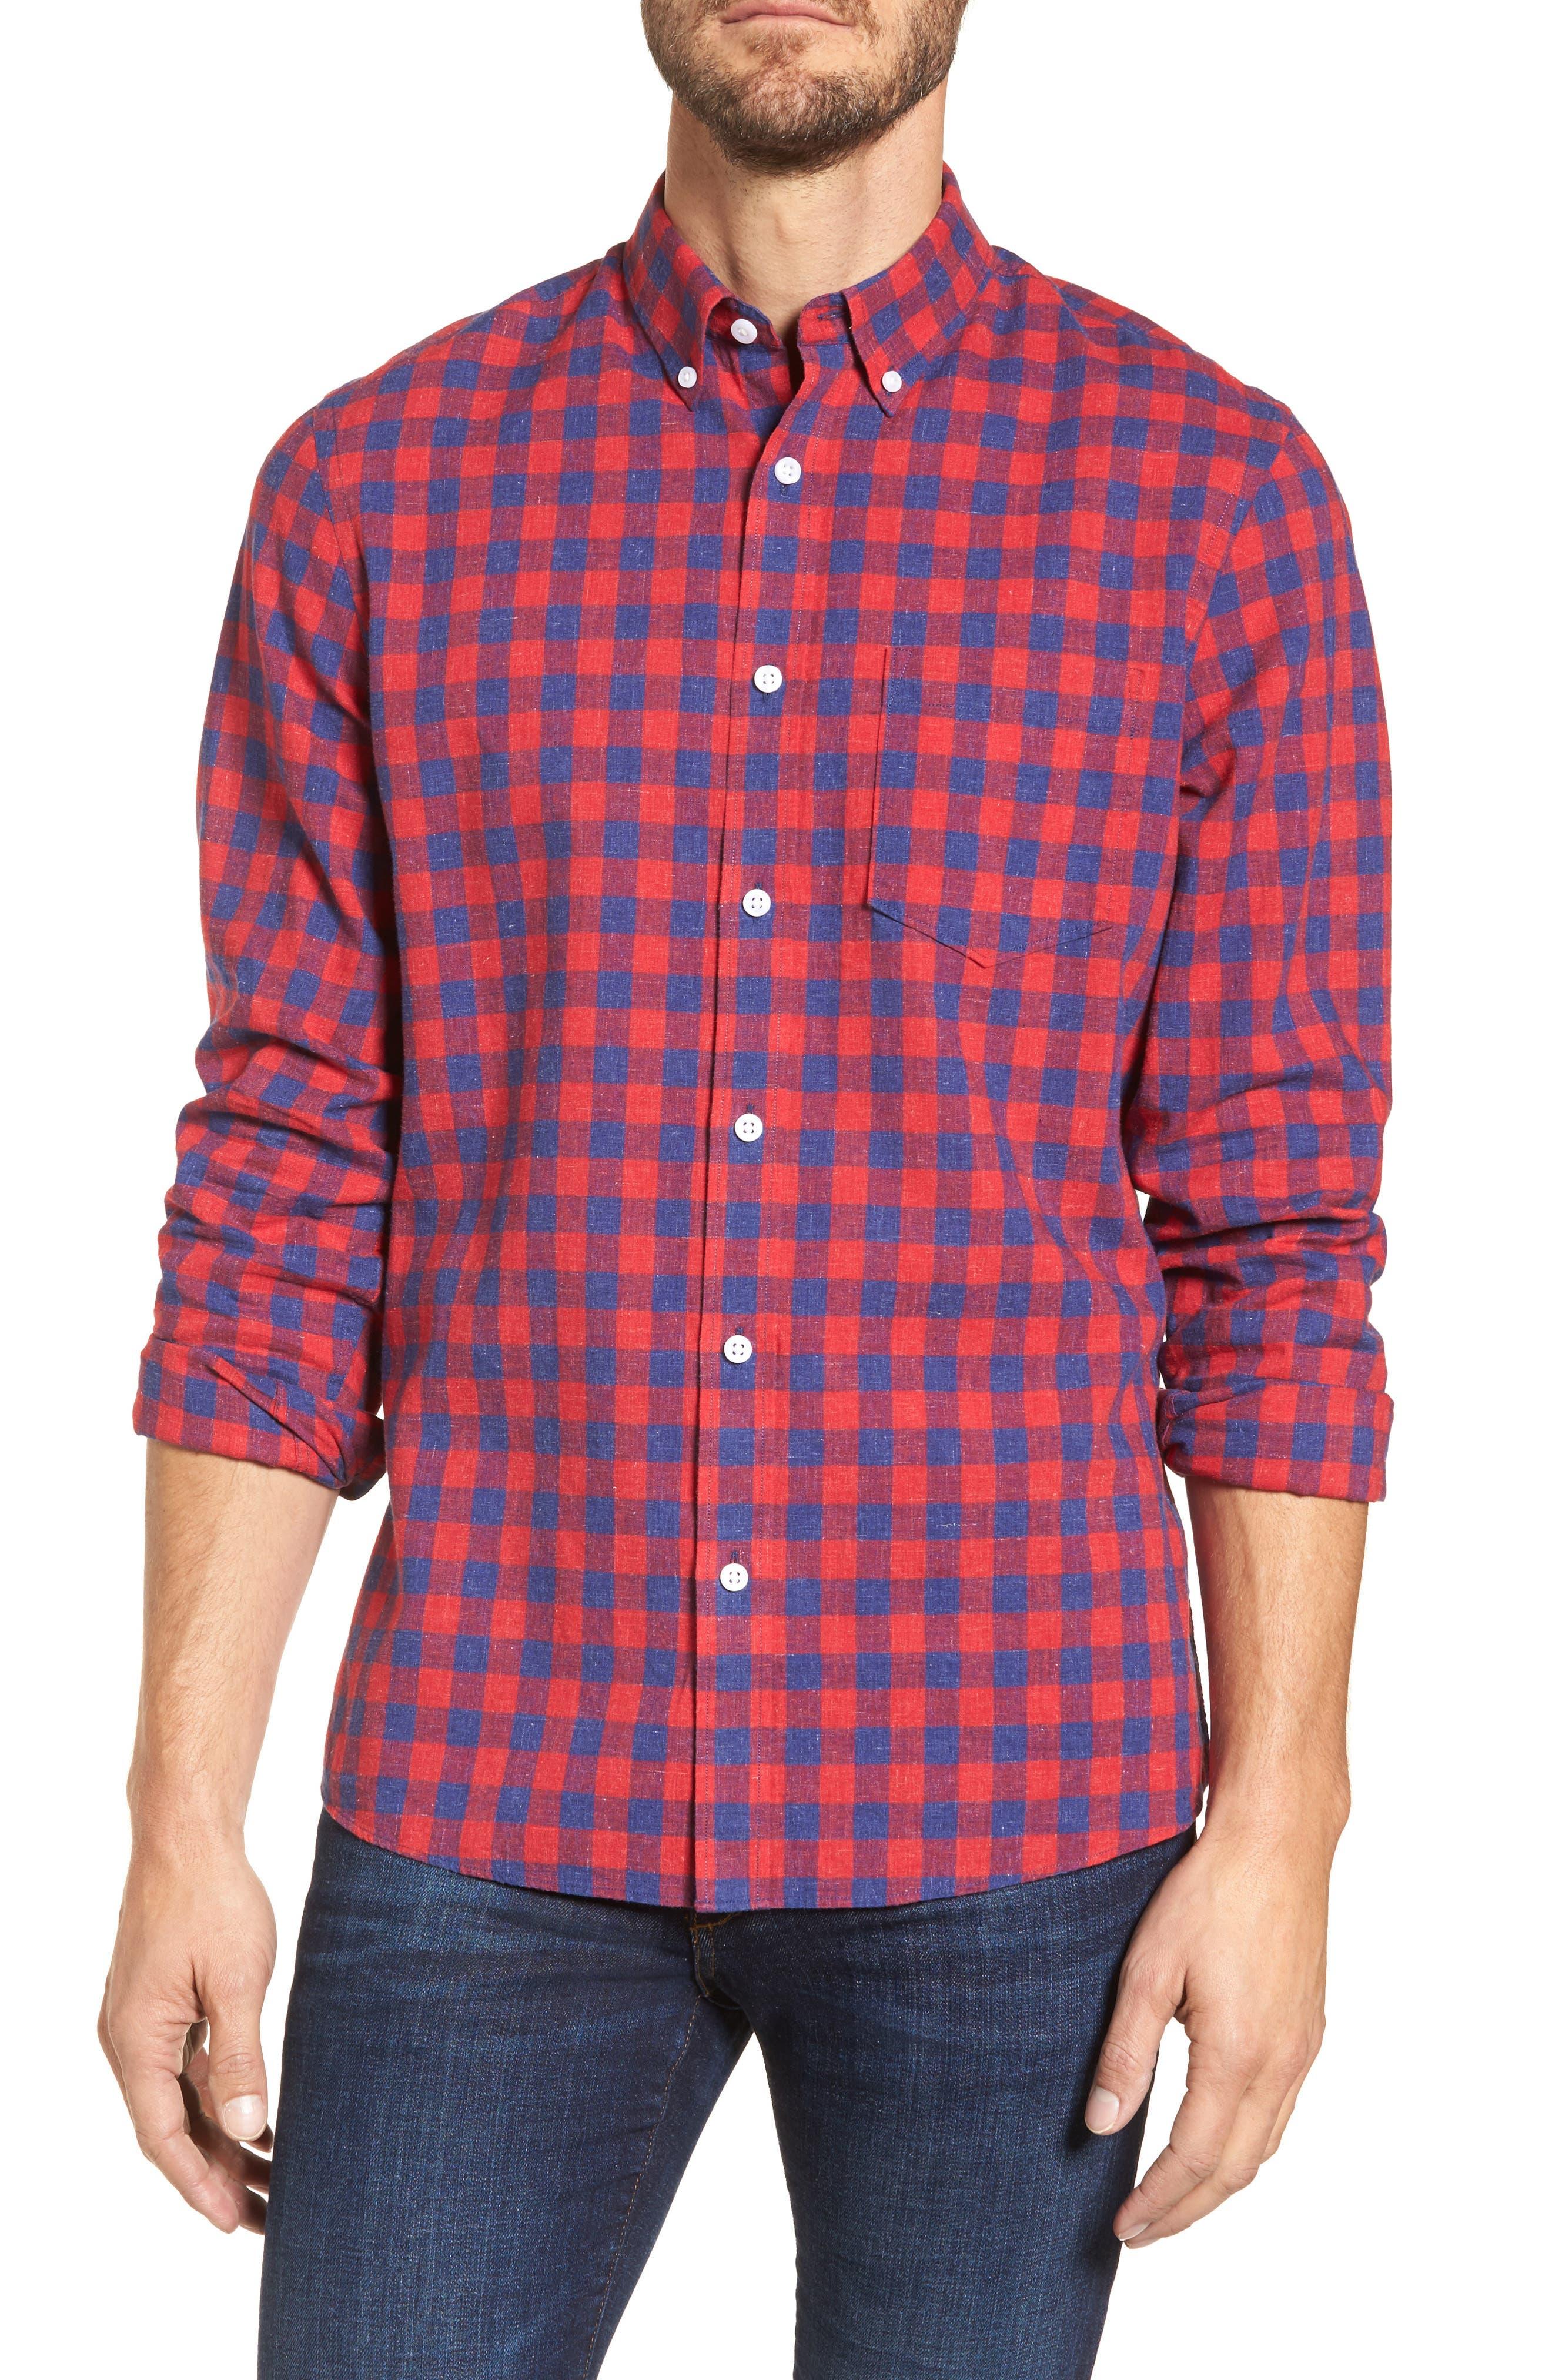 Spade Trim Fit Check Sport Shirt,                         Main,                         color, Red Chili Blue Check